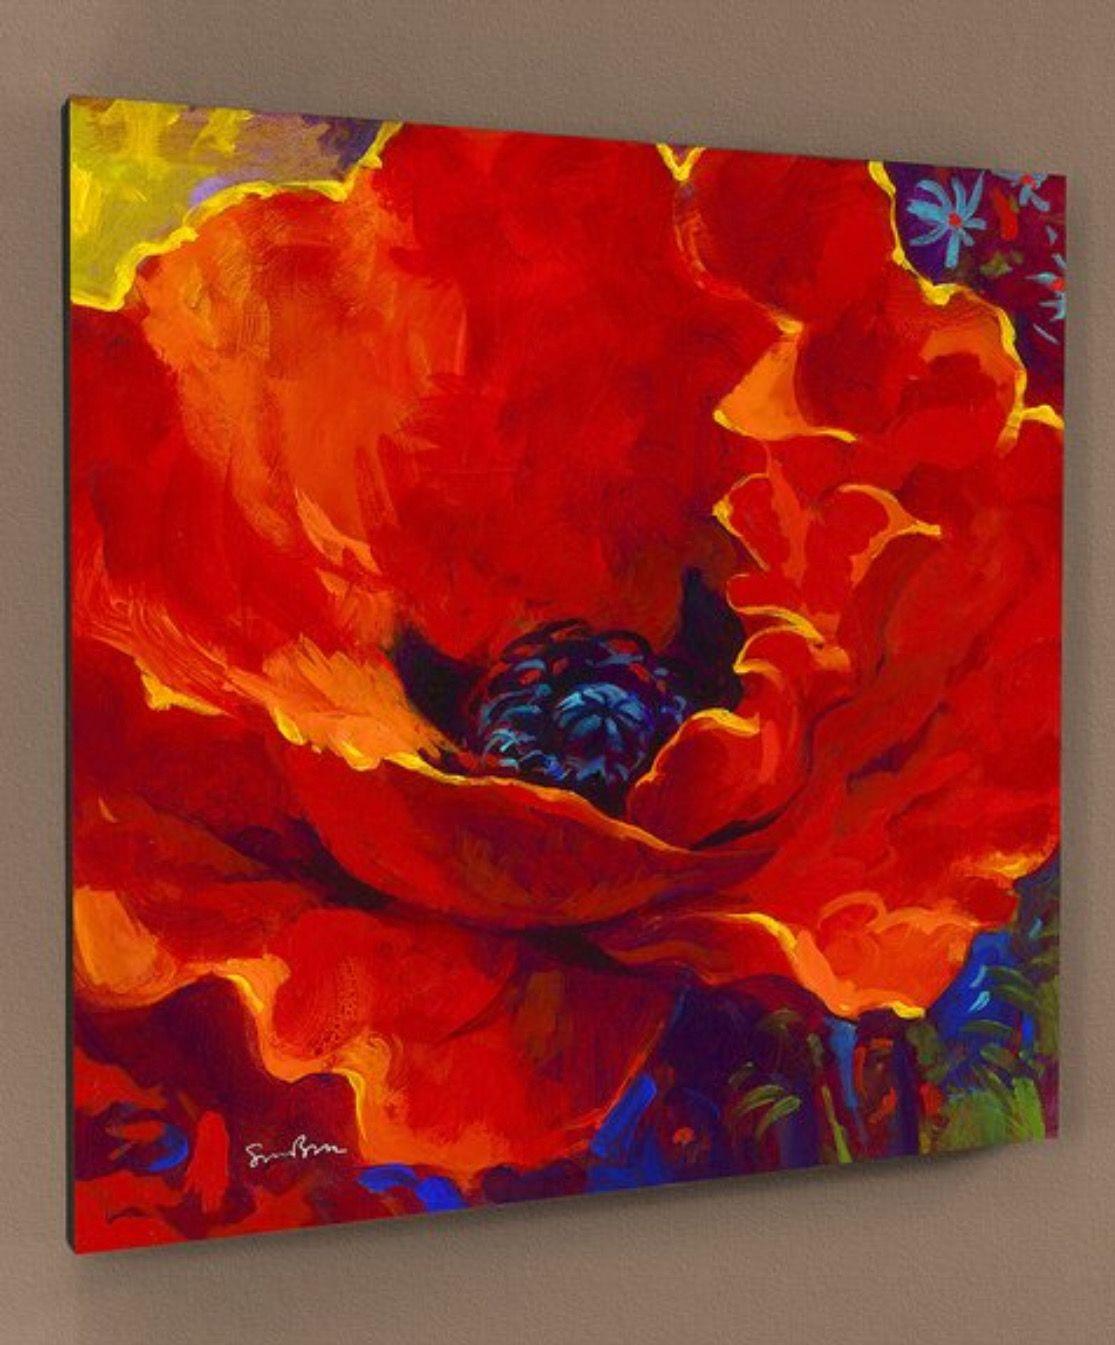 Pin de Javier en flores | Pinterest | Flores, Flores grandes y Cuadro